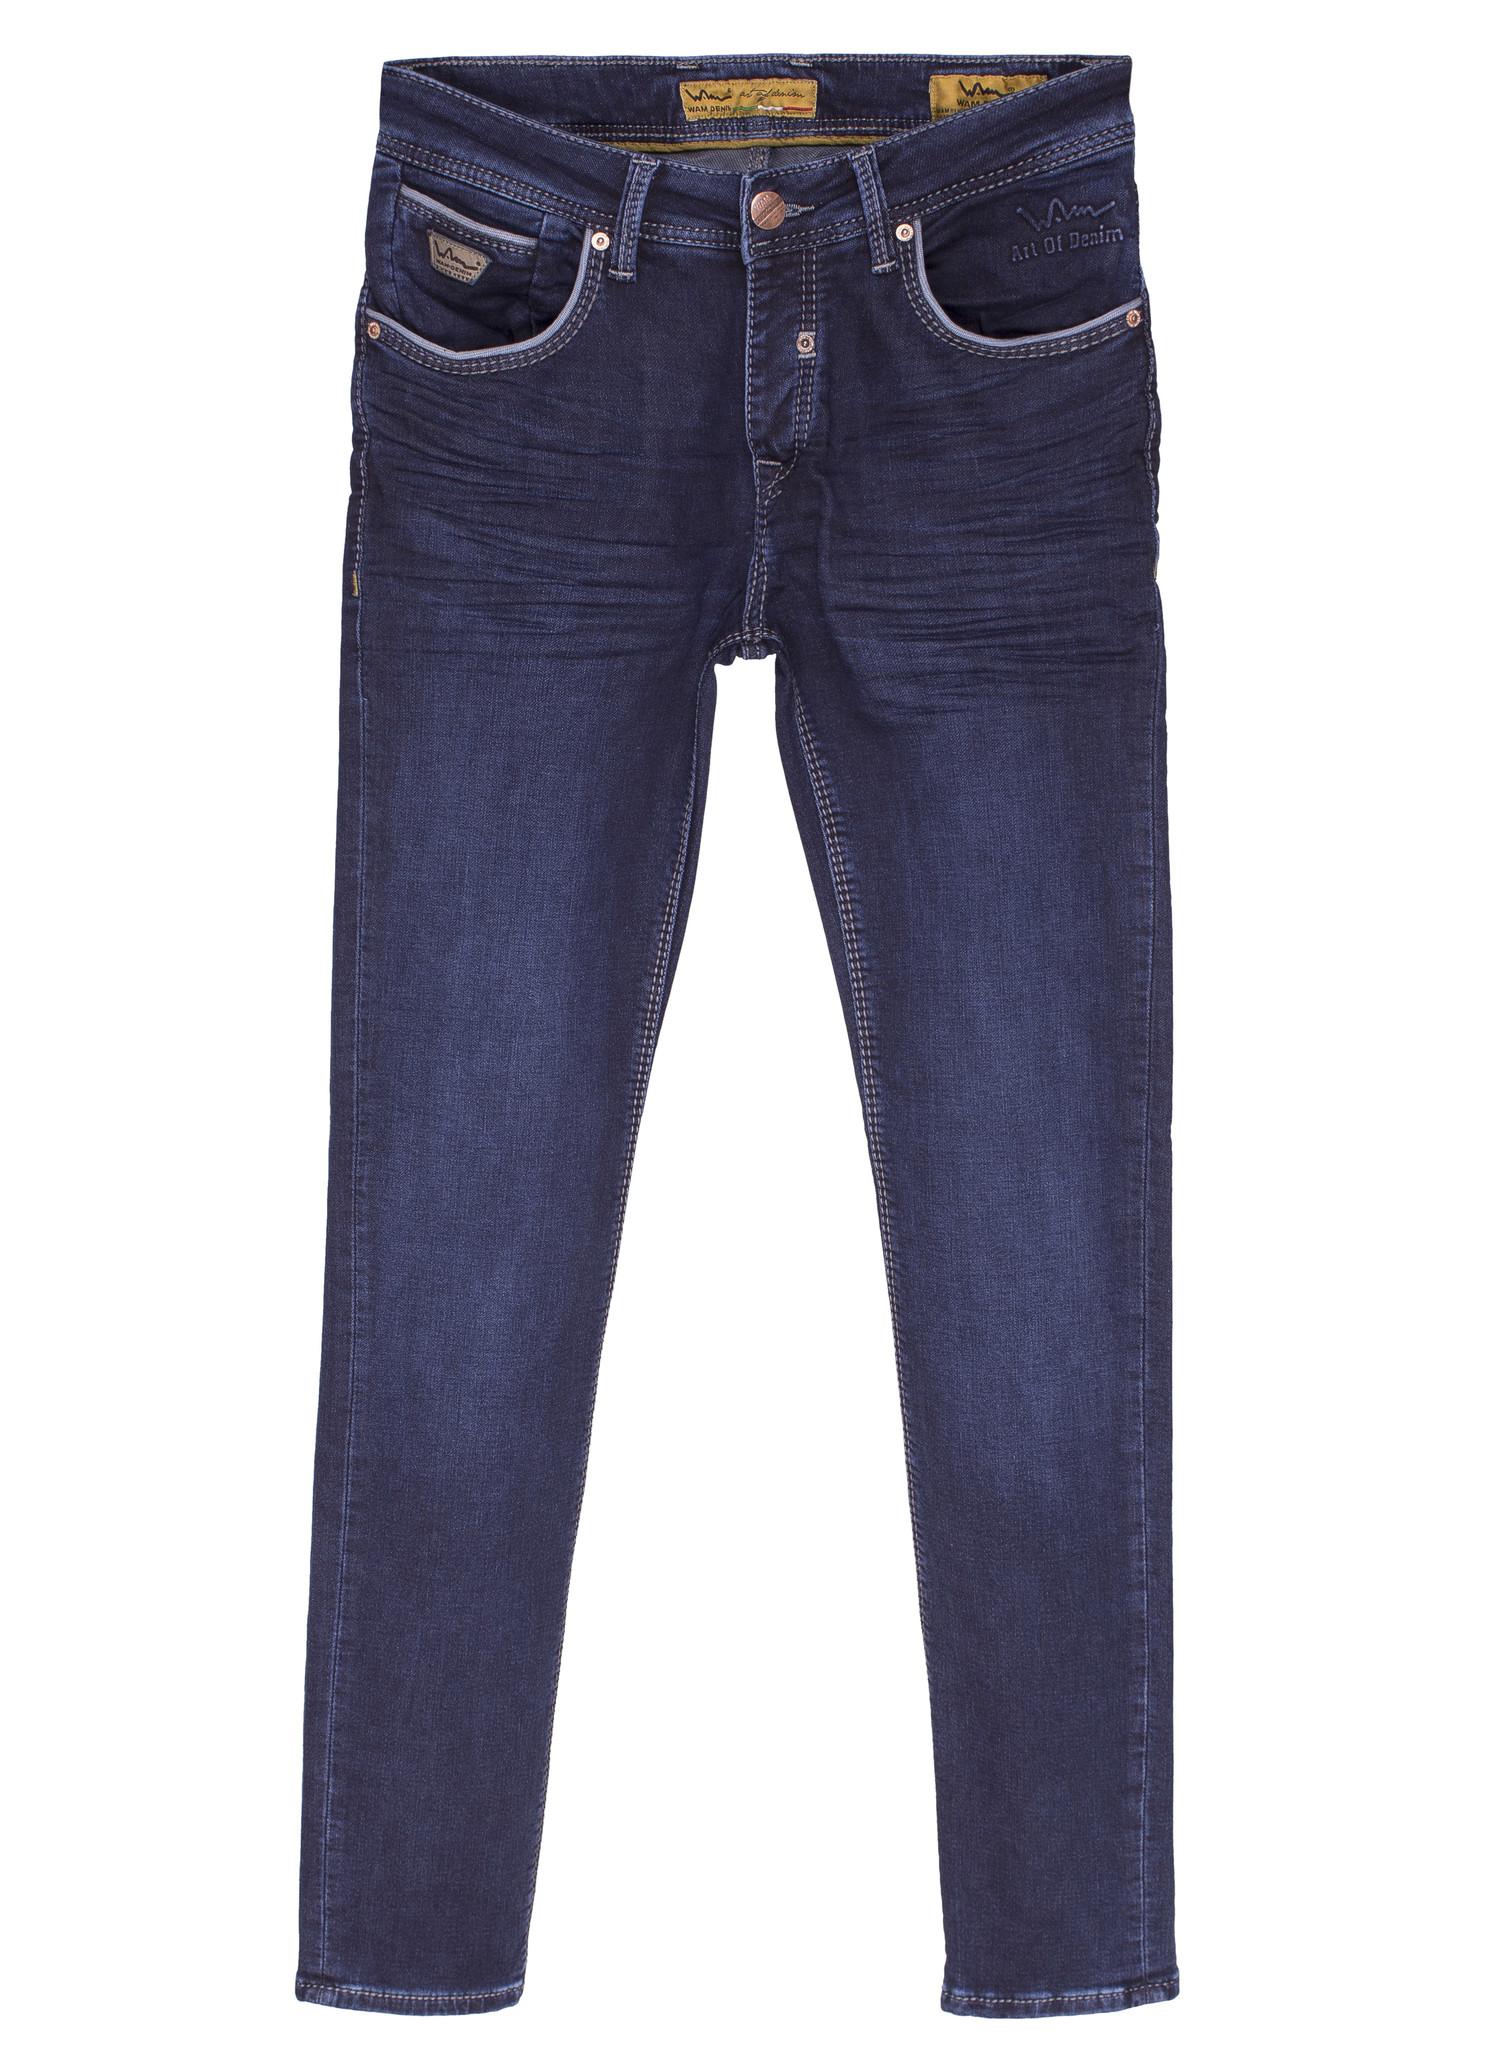 Wam Denim Jeans 92150 Dark Blue